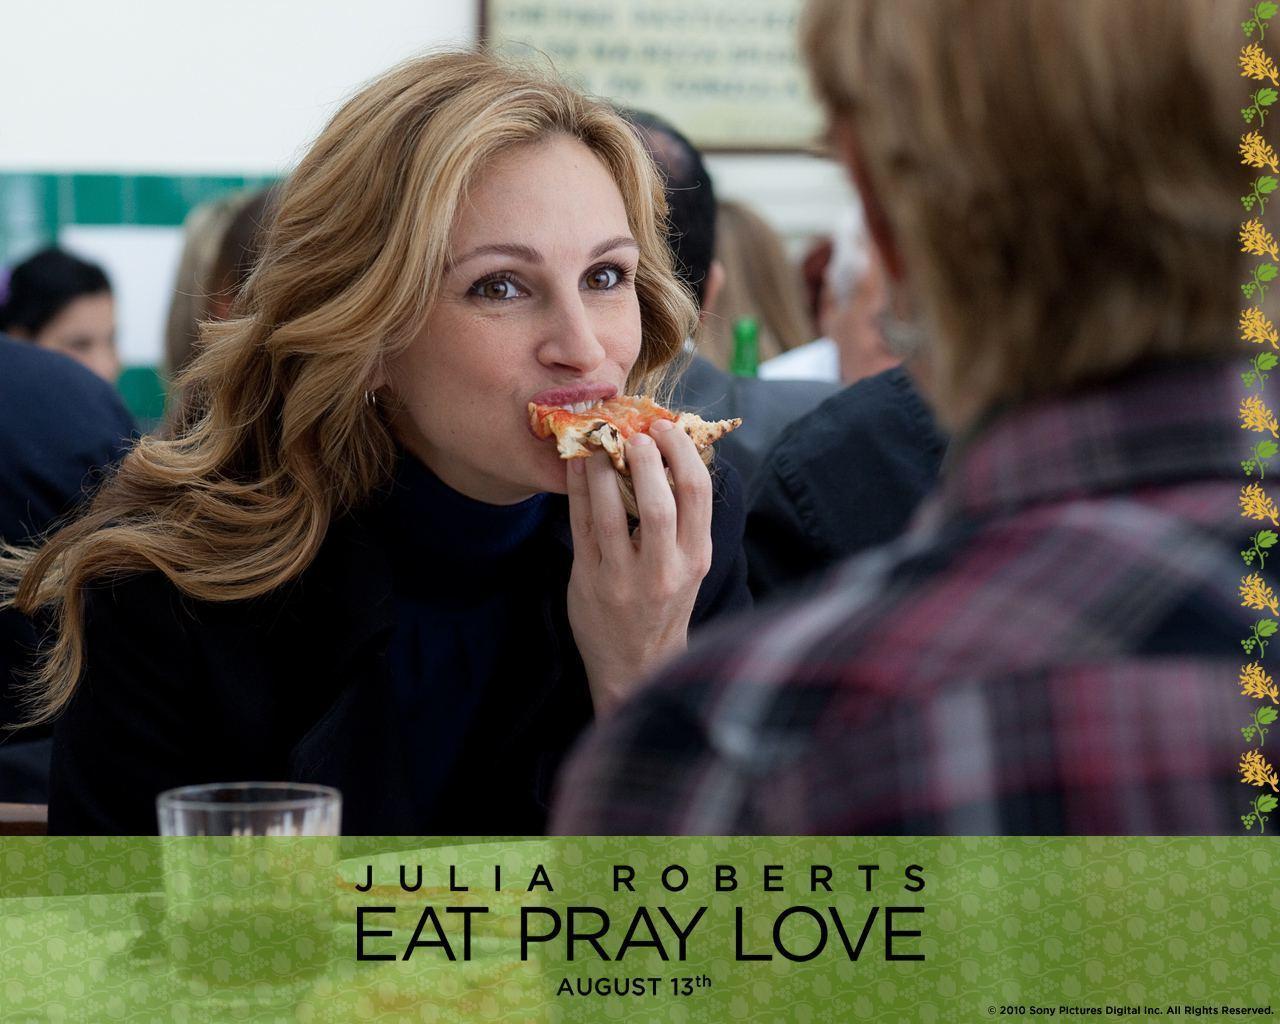 http://2.bp.blogspot.com/_-dvLf7e8bkE/TPBvPBfI_EI/AAAAAAAAAFU/ei-mb8hv26I/s1600/EPL-Wallpaper-eat-pray-love-14039066-1280-1024.jpg